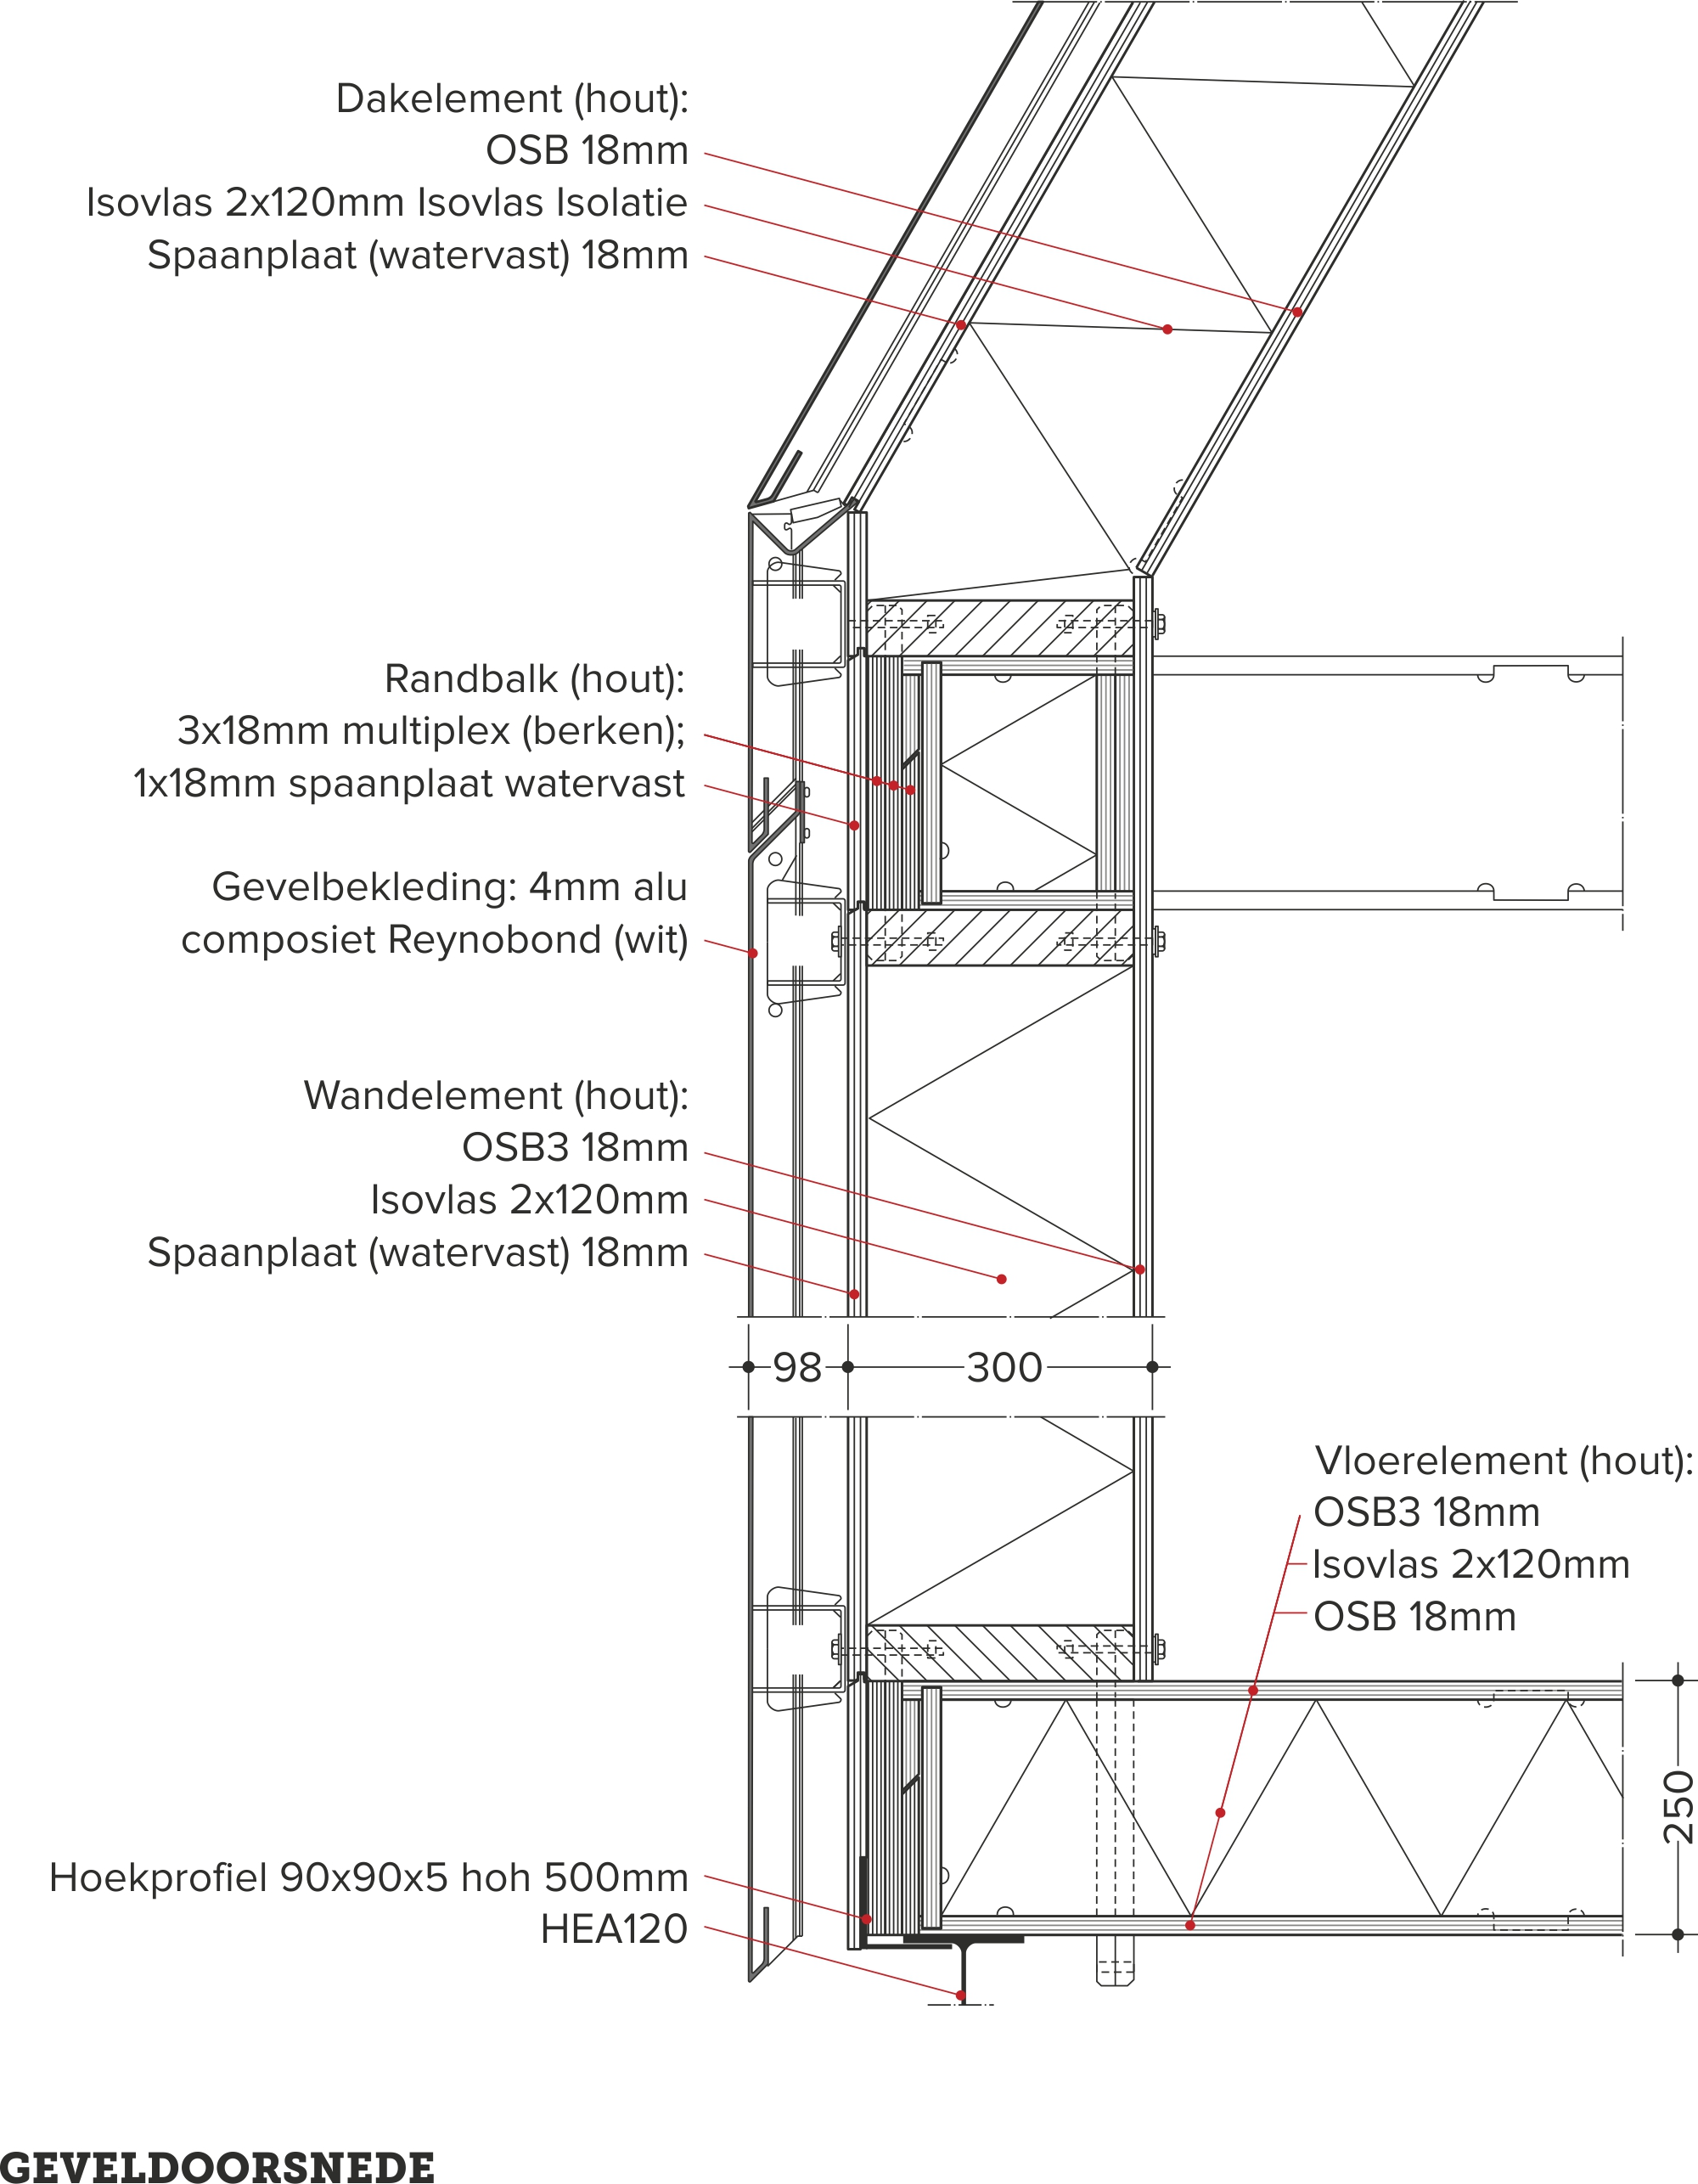 bouwmethode, product development lab delft, cnc-gefreesde platen